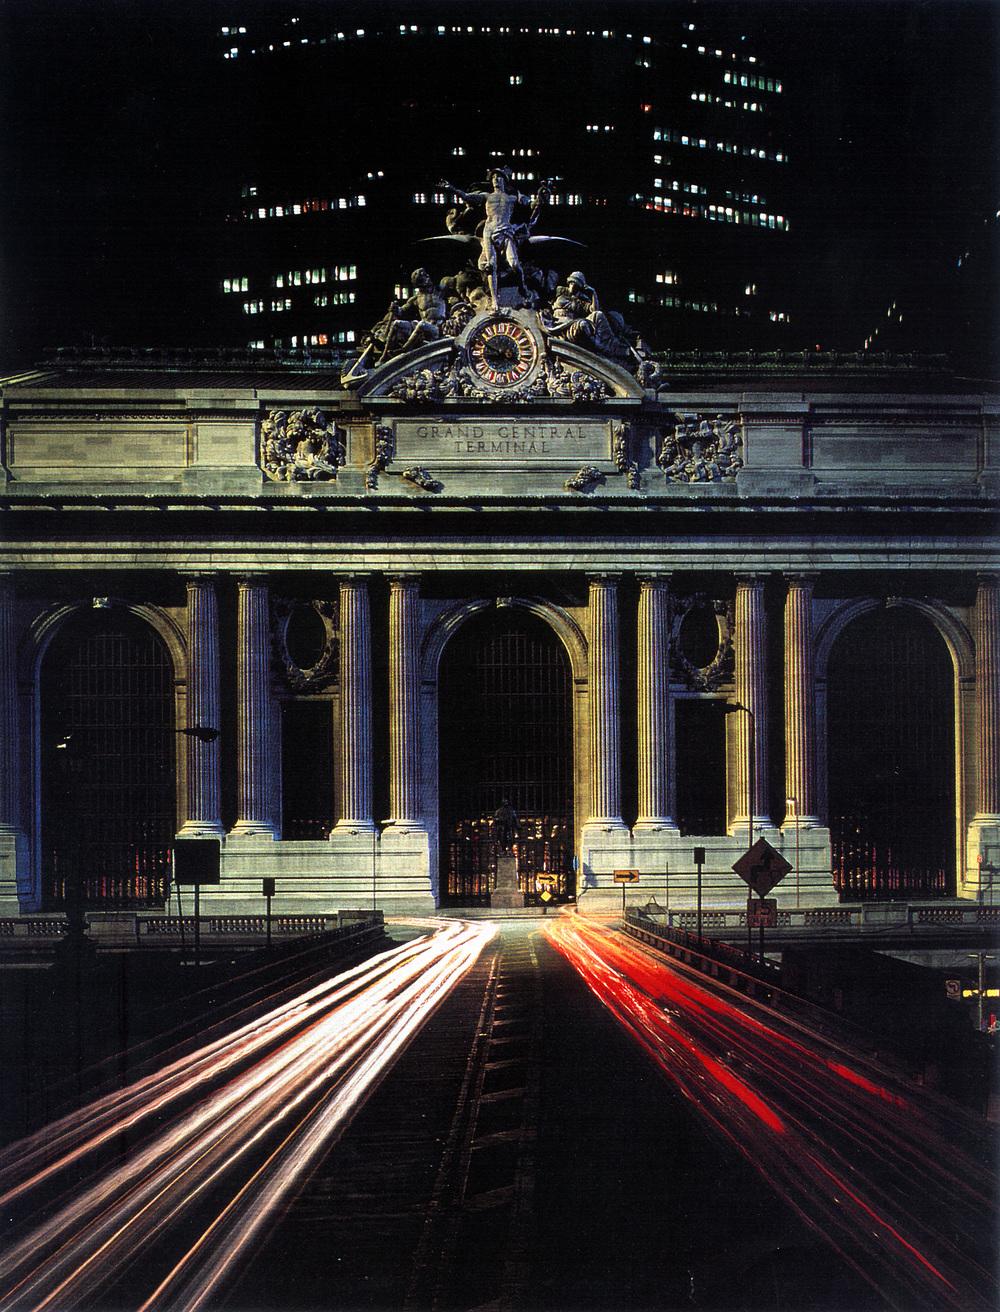 Grand Central - Night.jpg